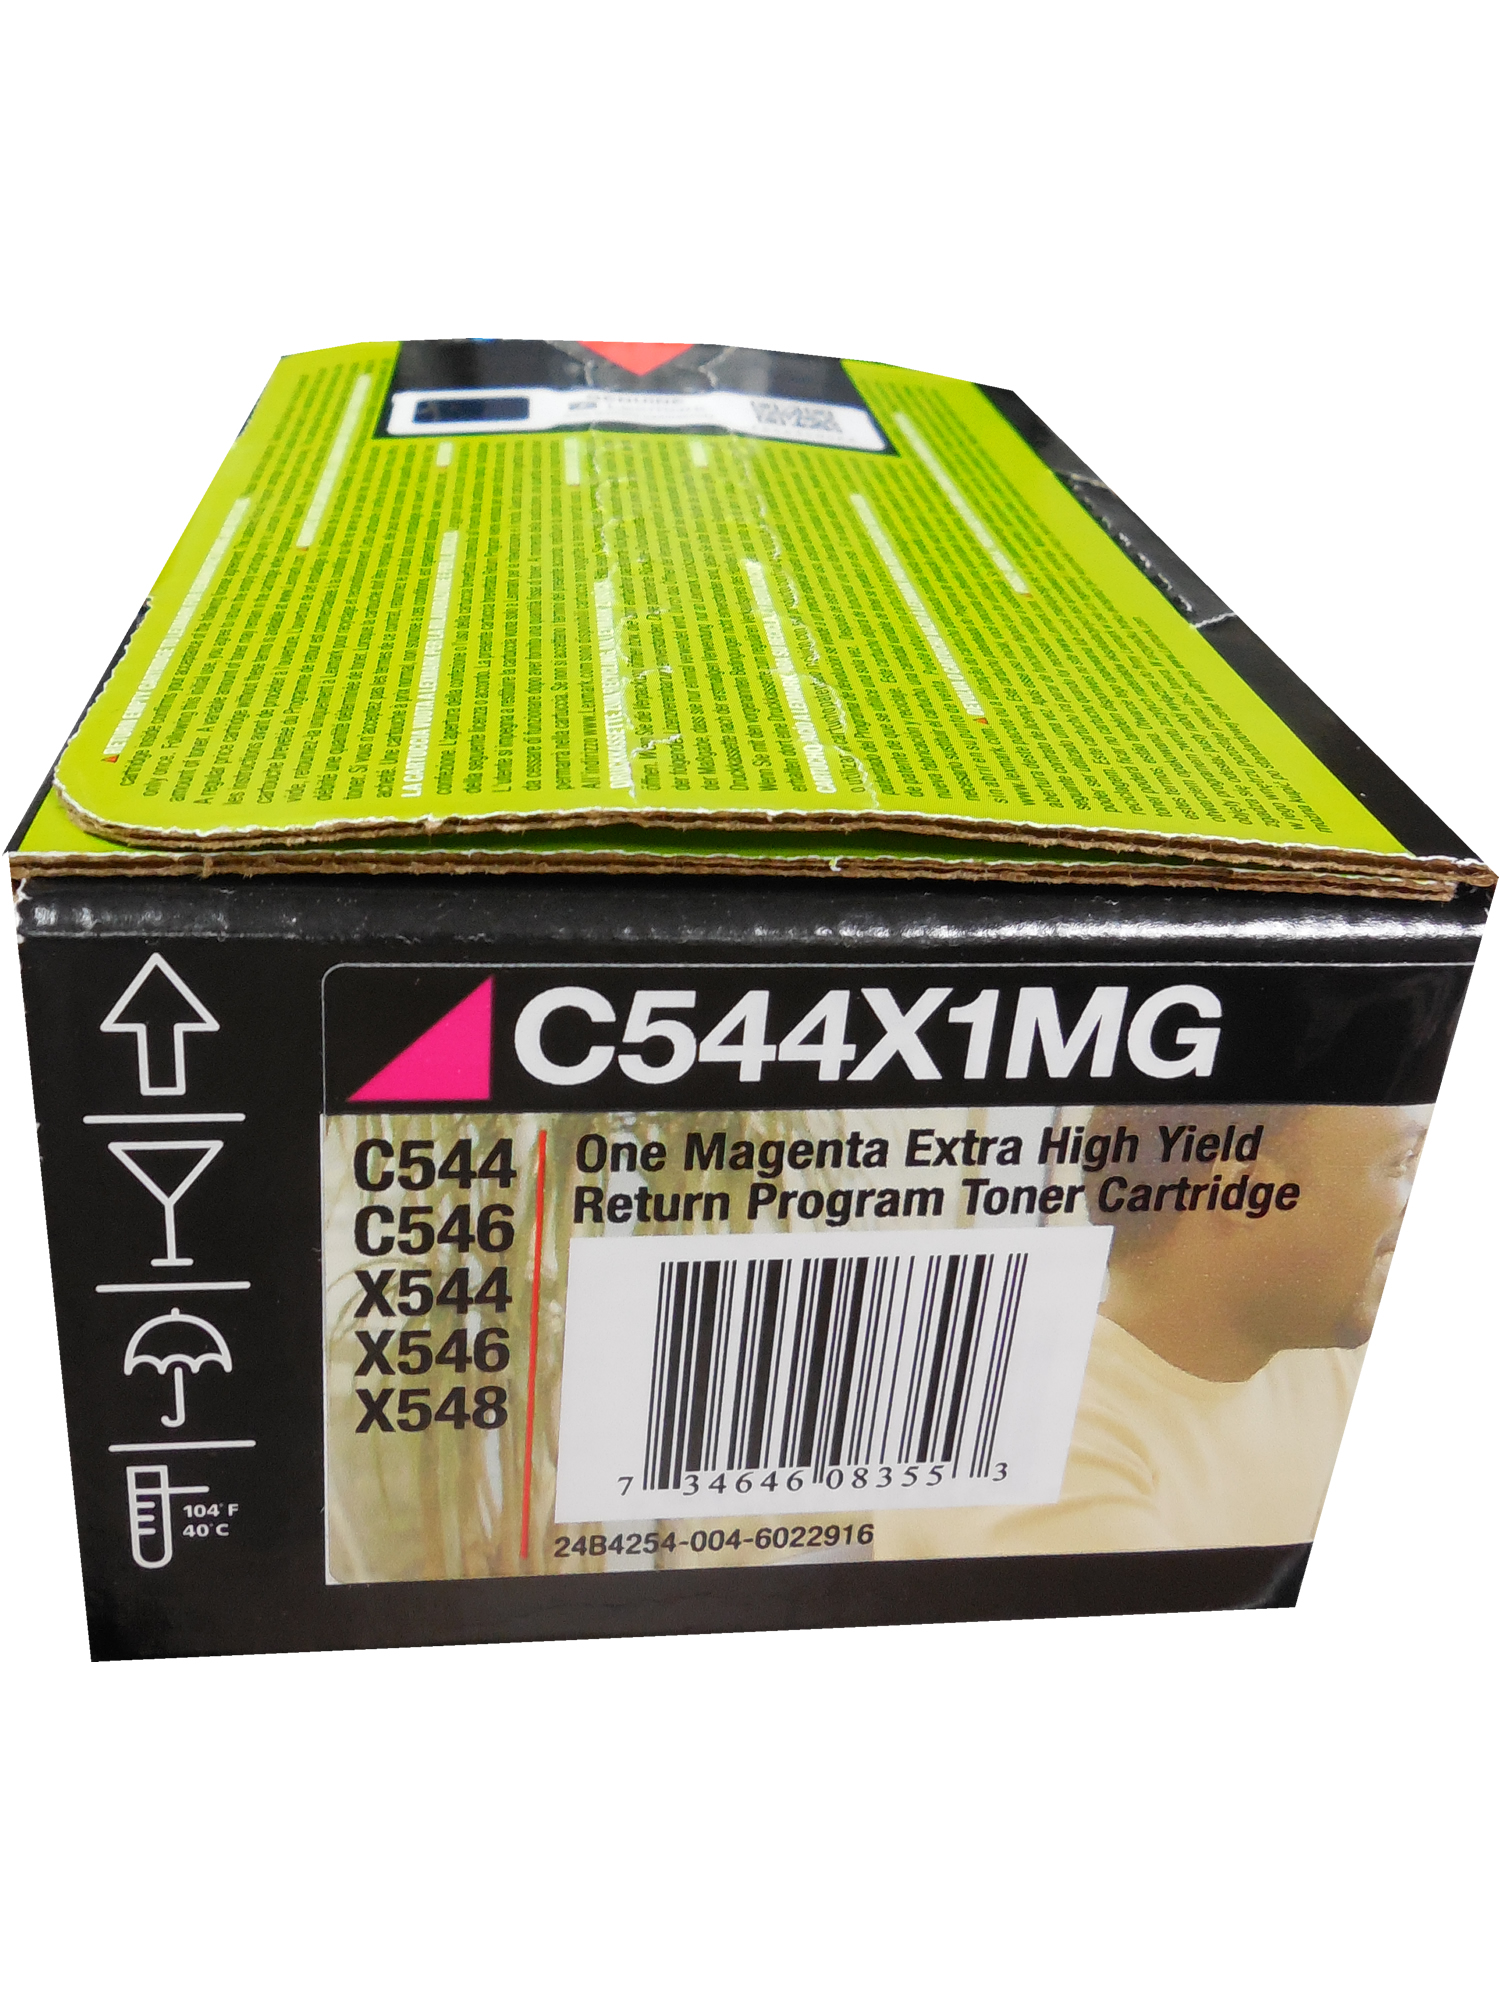 Lexmark Compatible C544 Magenta Extra High Yield 4K Toner C544X1MG-C